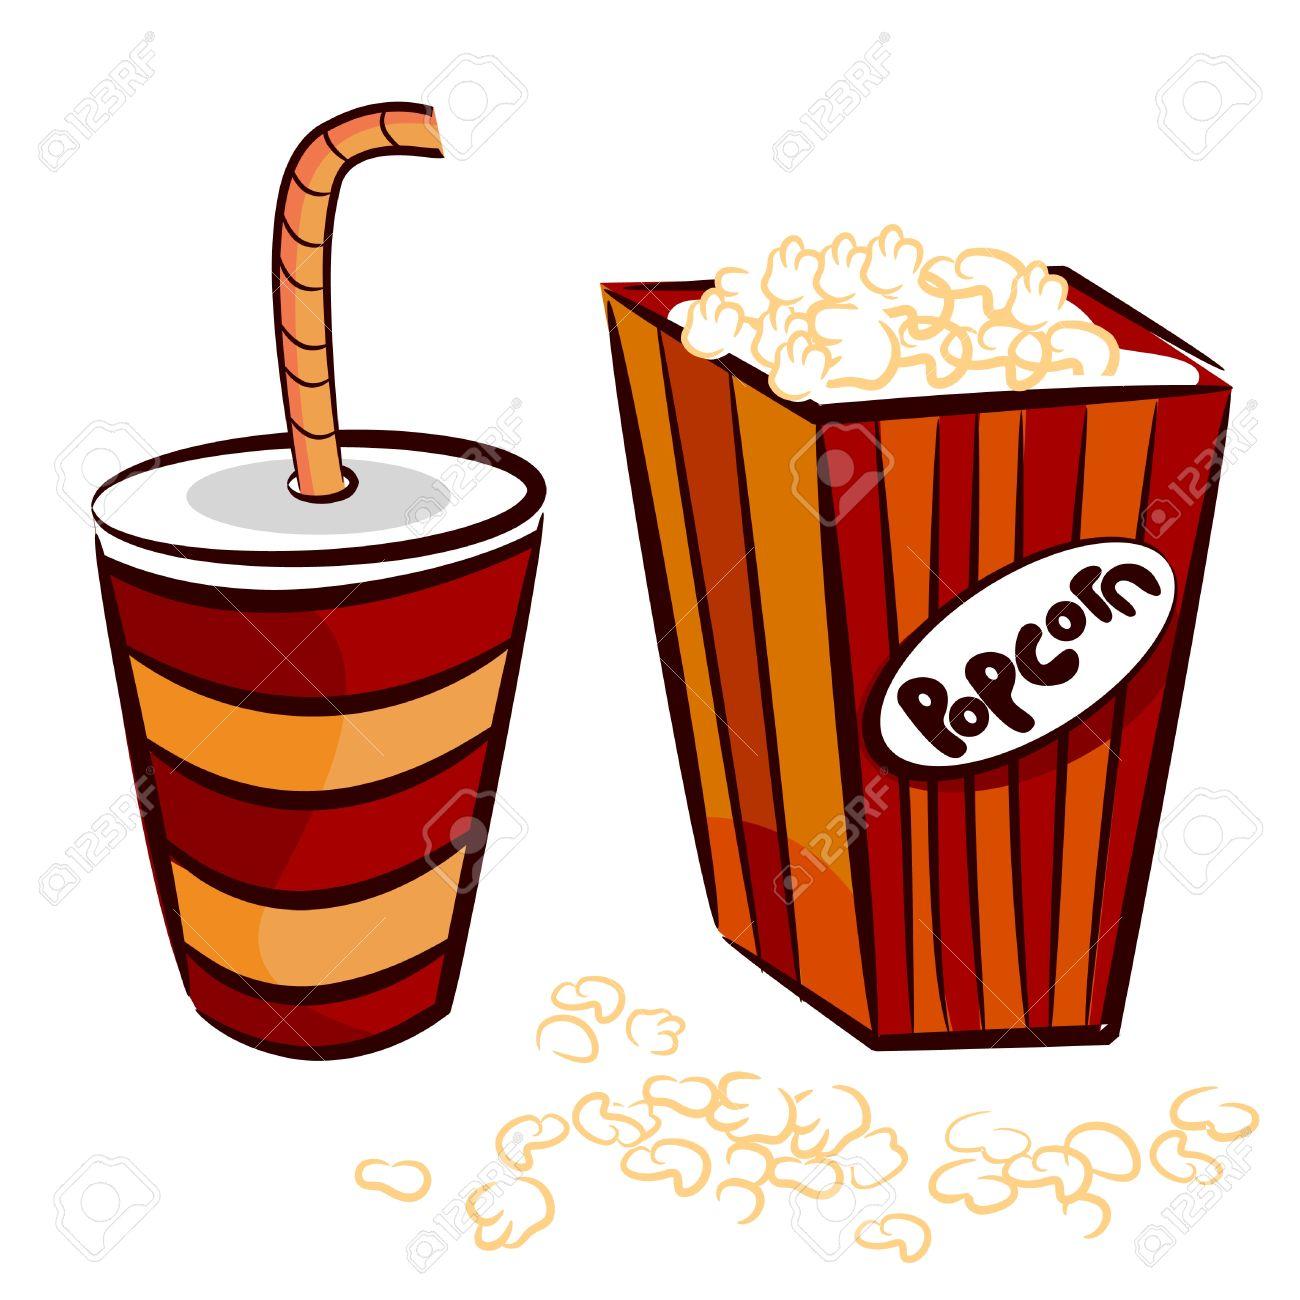 Popcorn Clipart